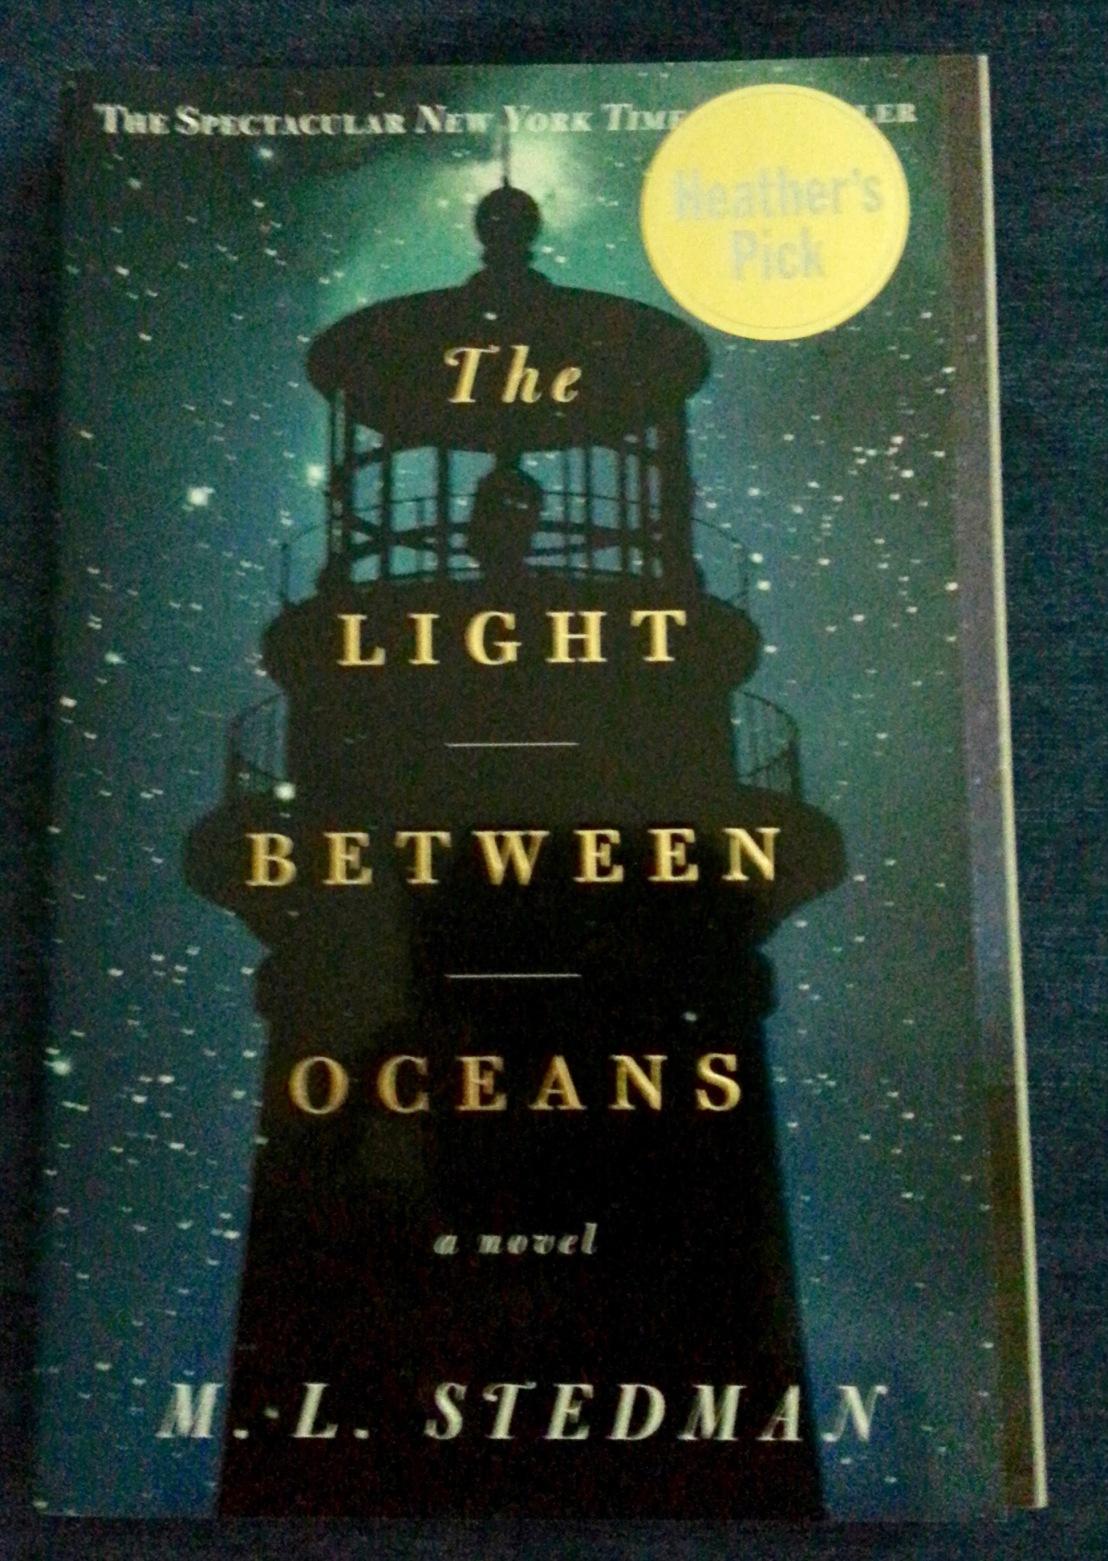 M.L. Stedman's — The Light Between Oceans*****